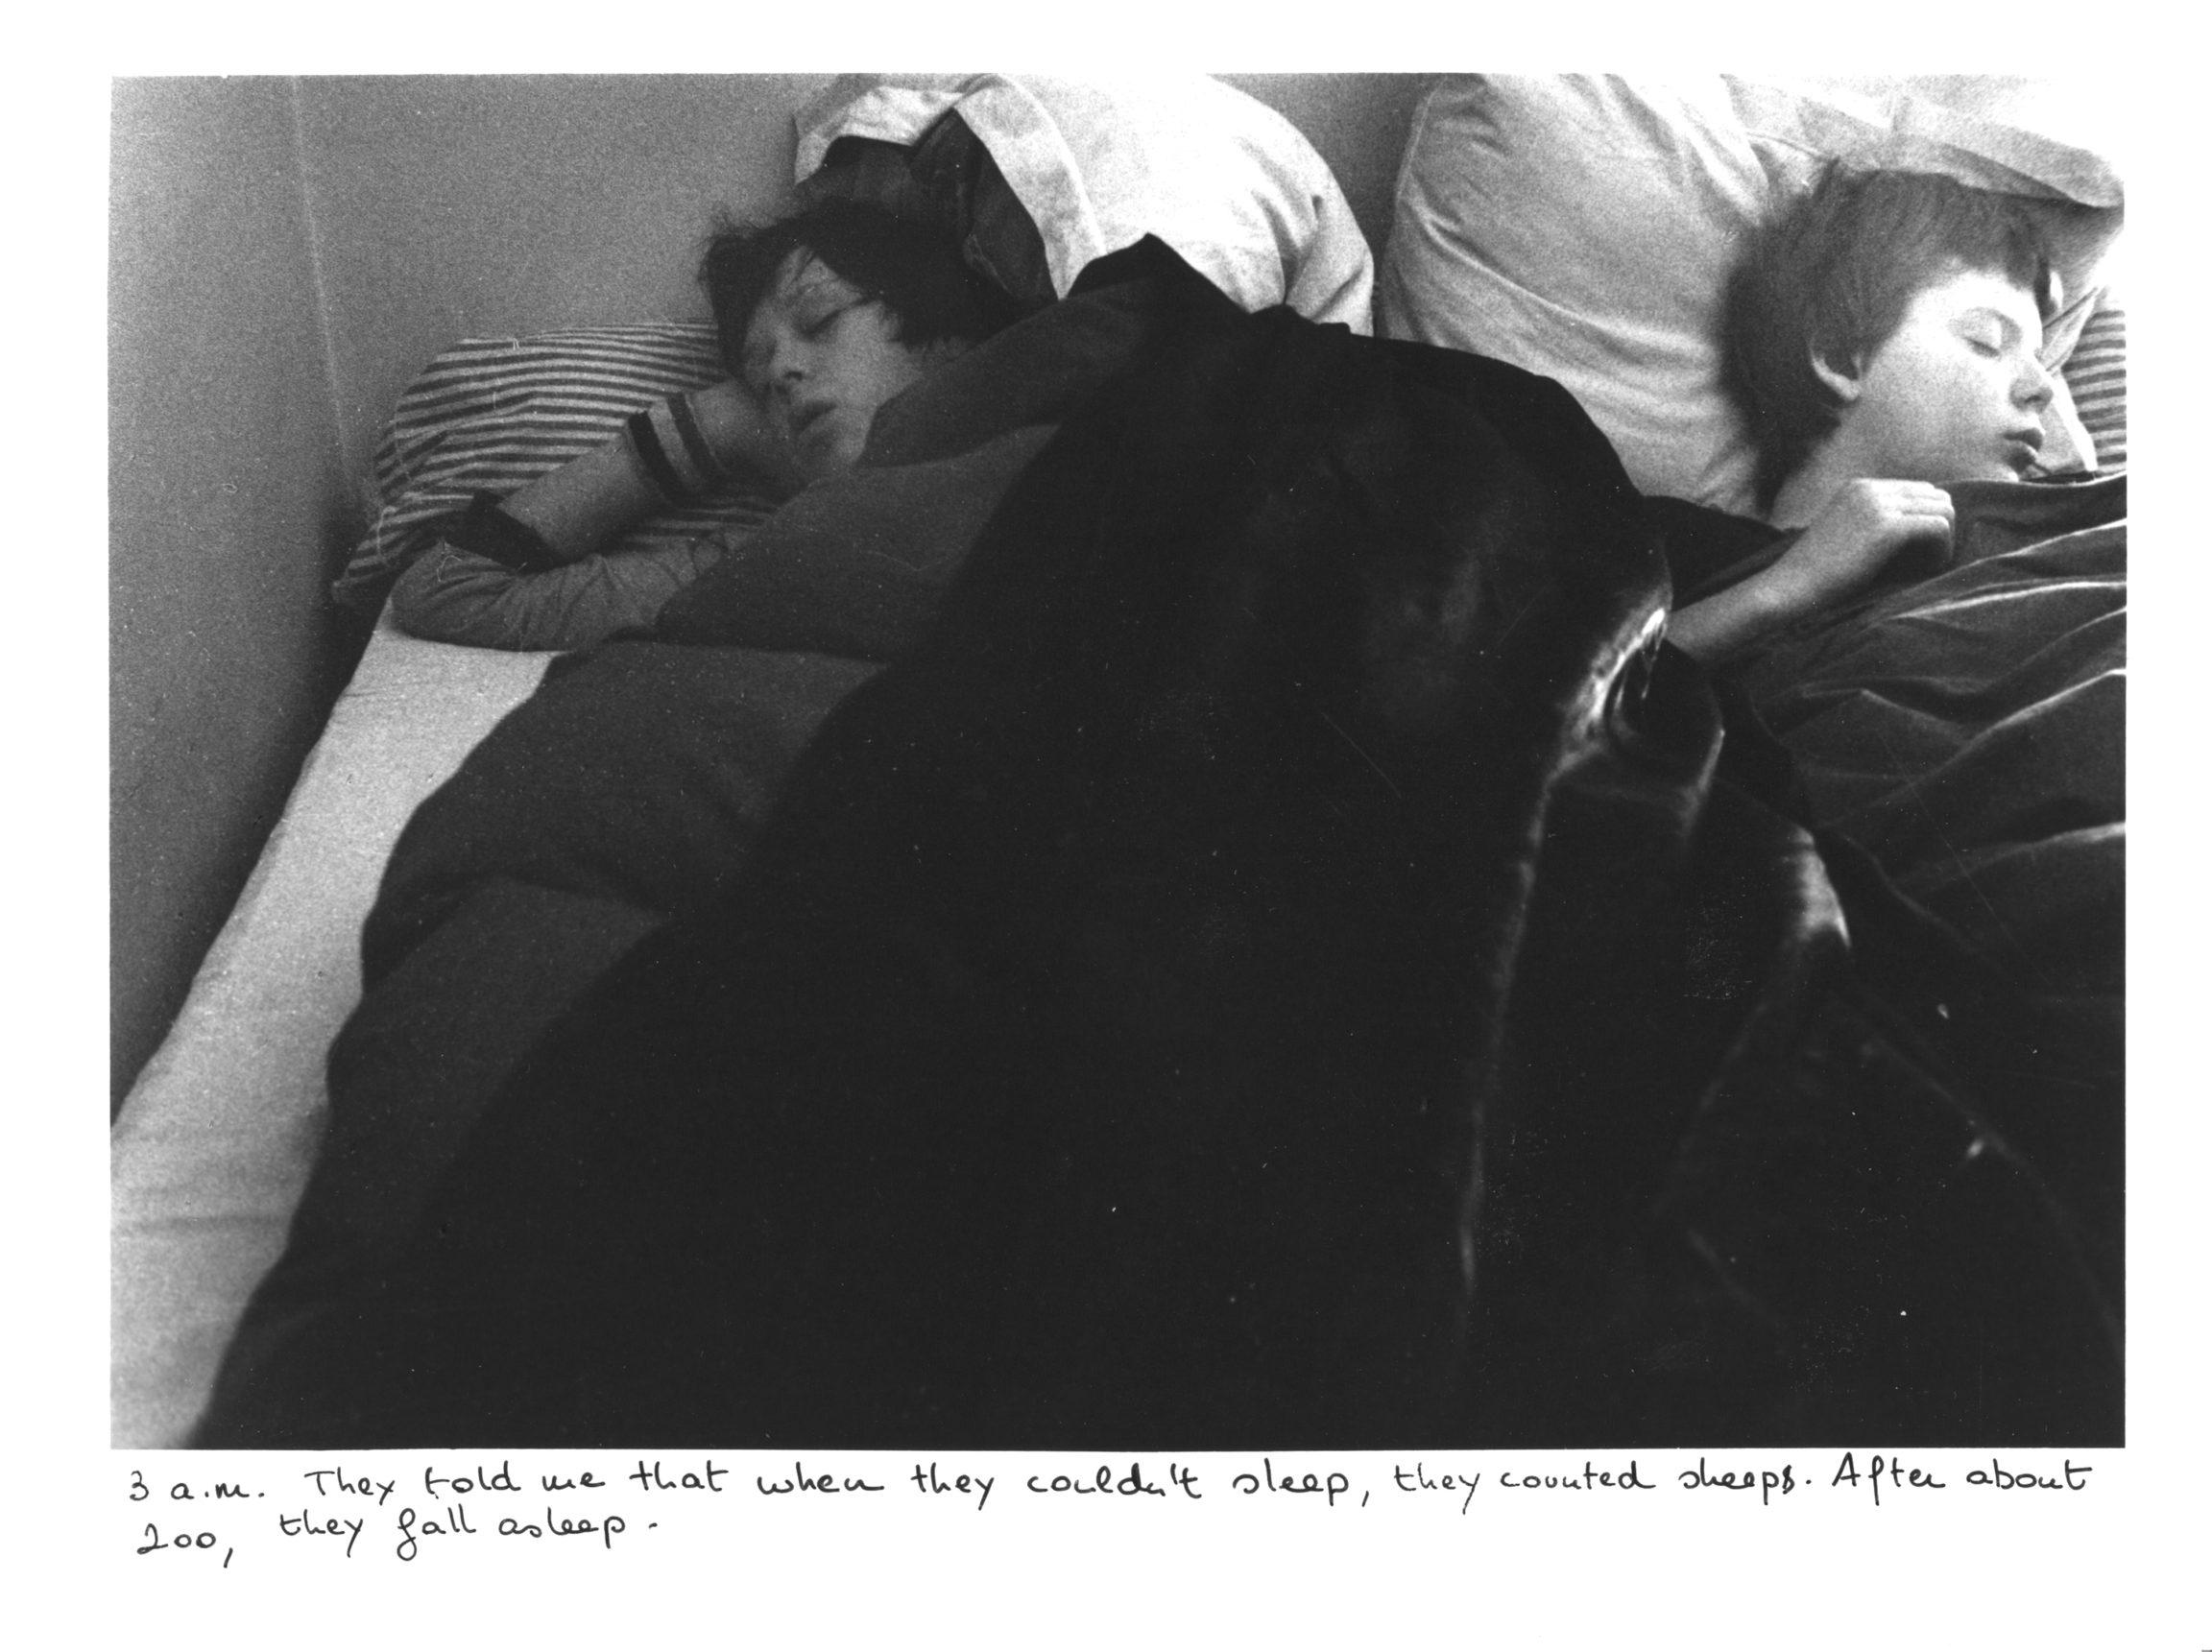 Sophie Calle , The Sleepers (Antoine Gonthier, Twentieth Sleeper, and Patrice X., Twenty-First Sleeper), 1979